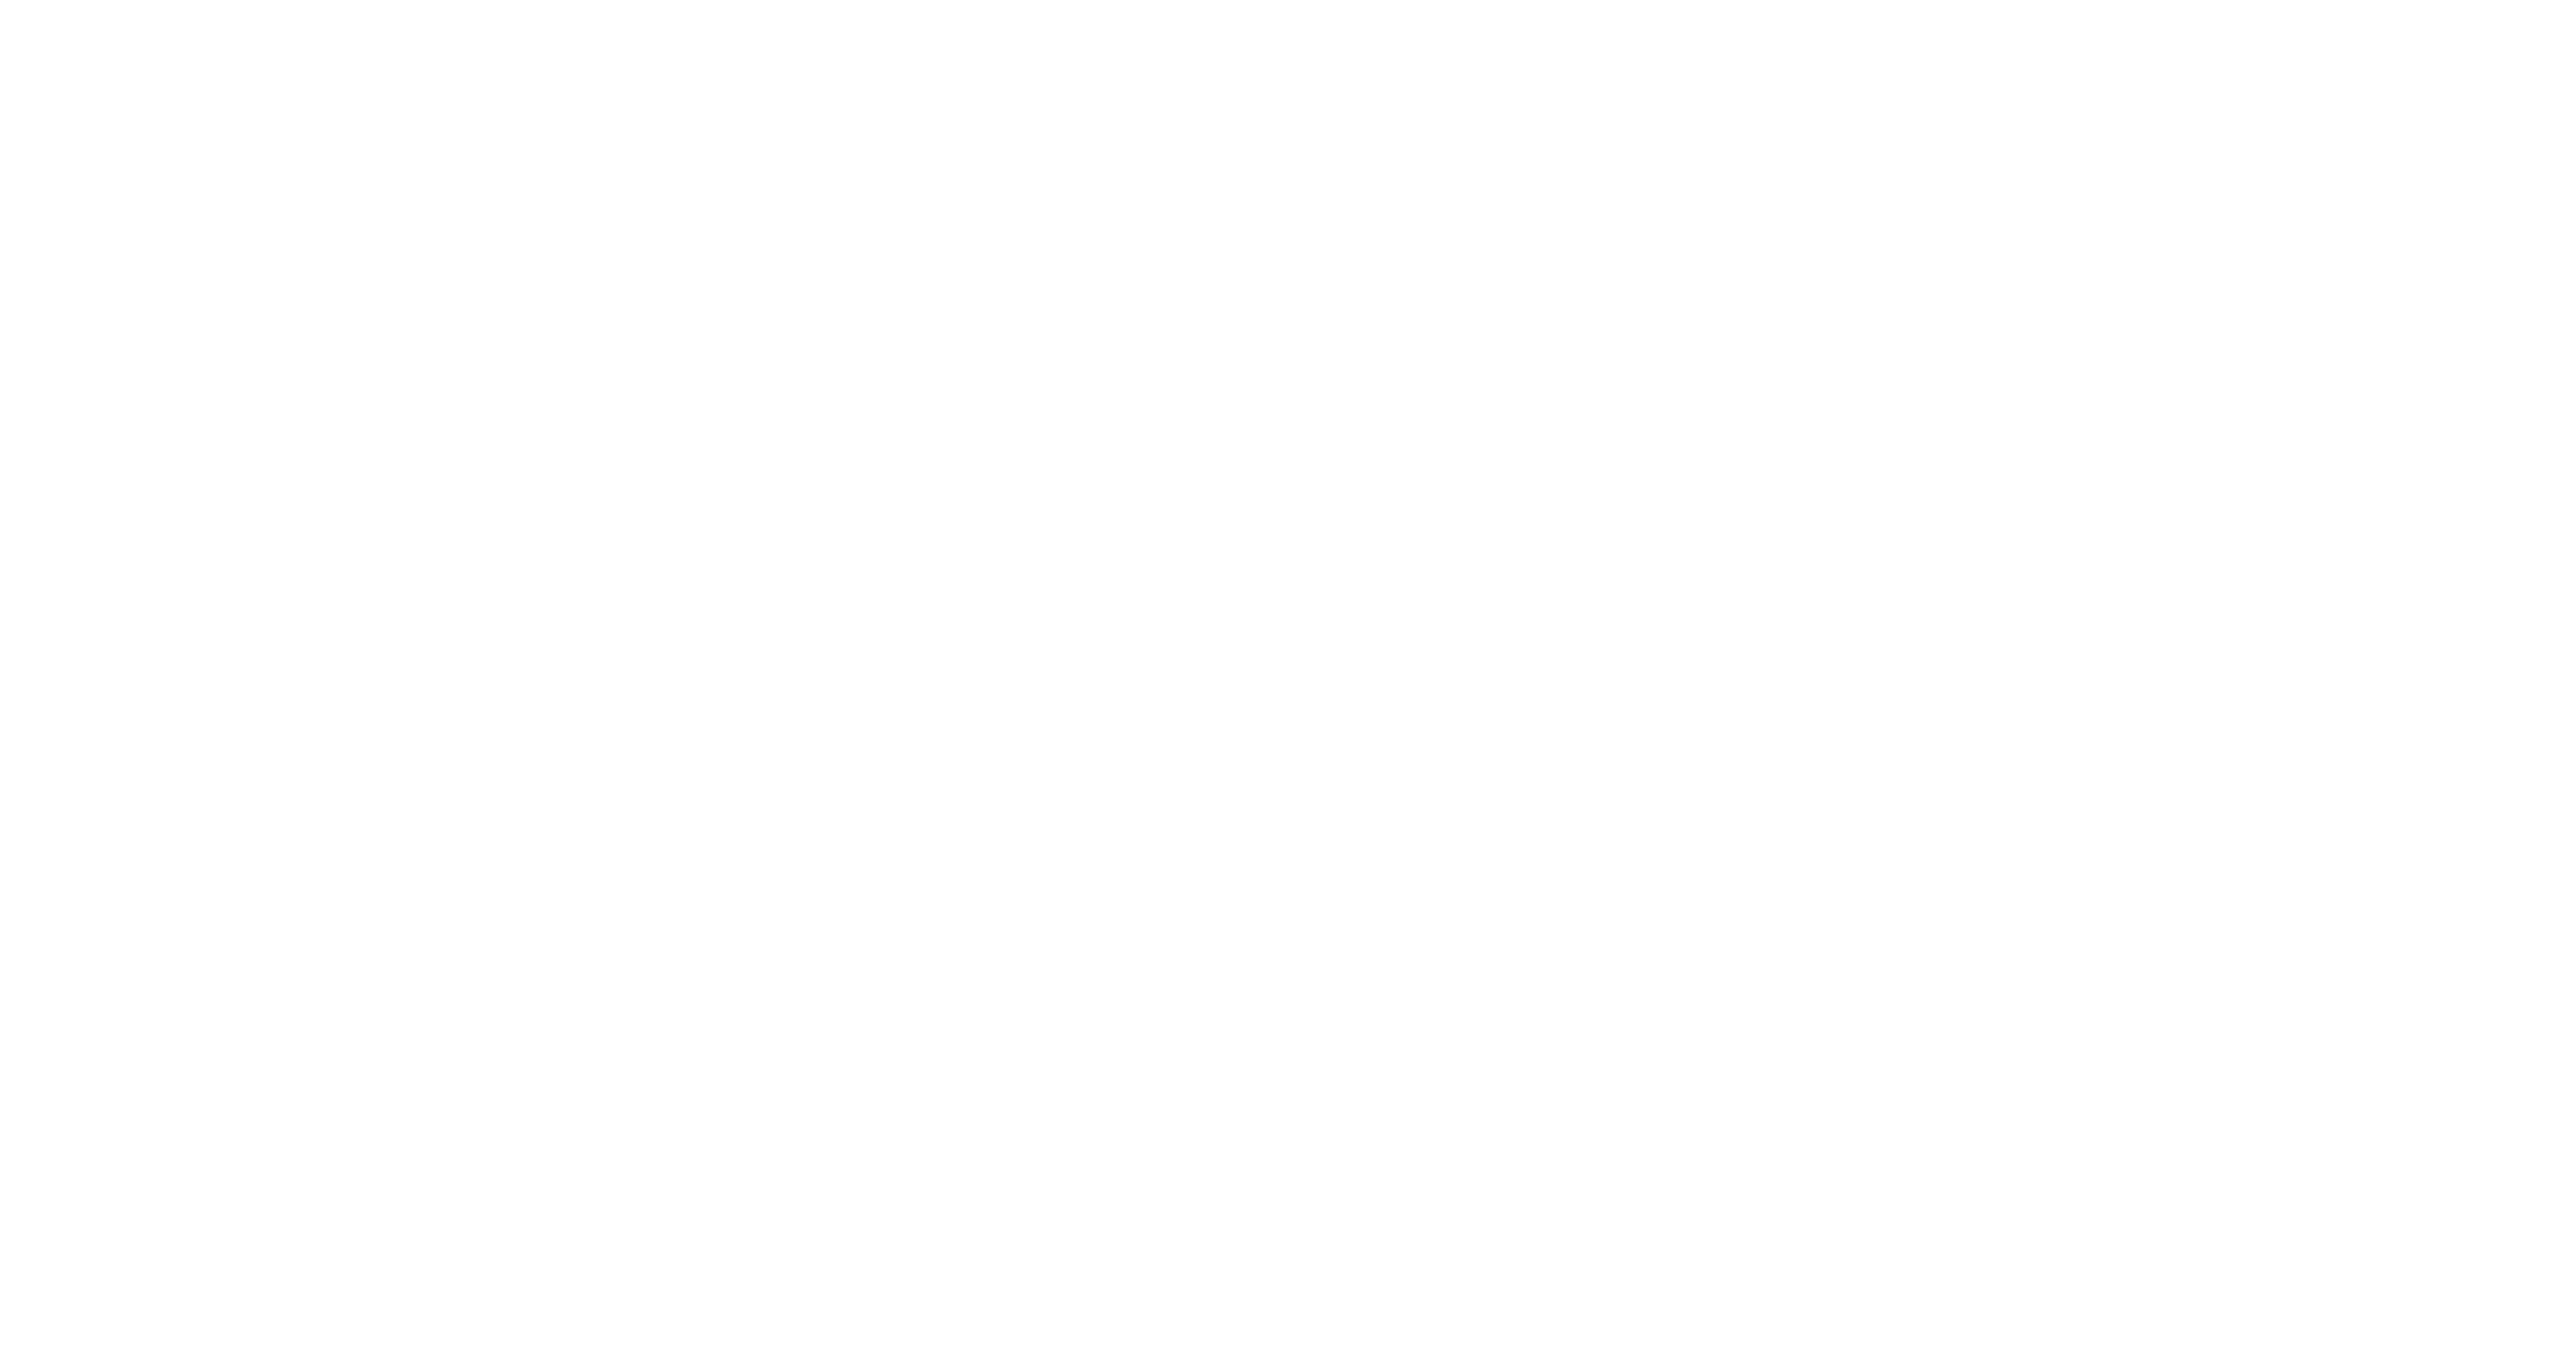 struktur logo-03